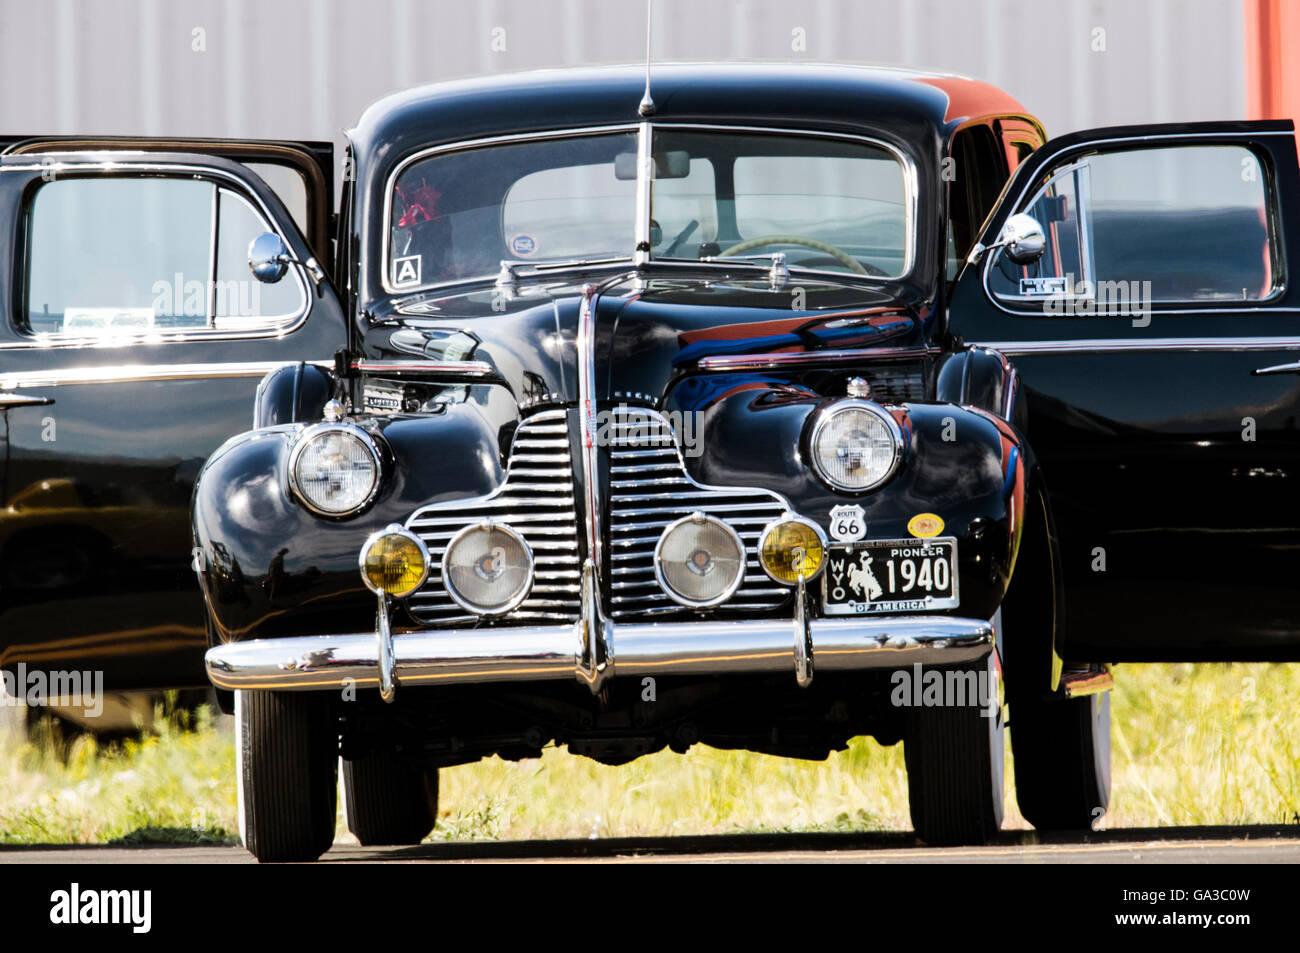 Antik 1940 Buick Automobil bei Salida Art Walk Fly-in Event; zentralen Colorado; USA Stockbild